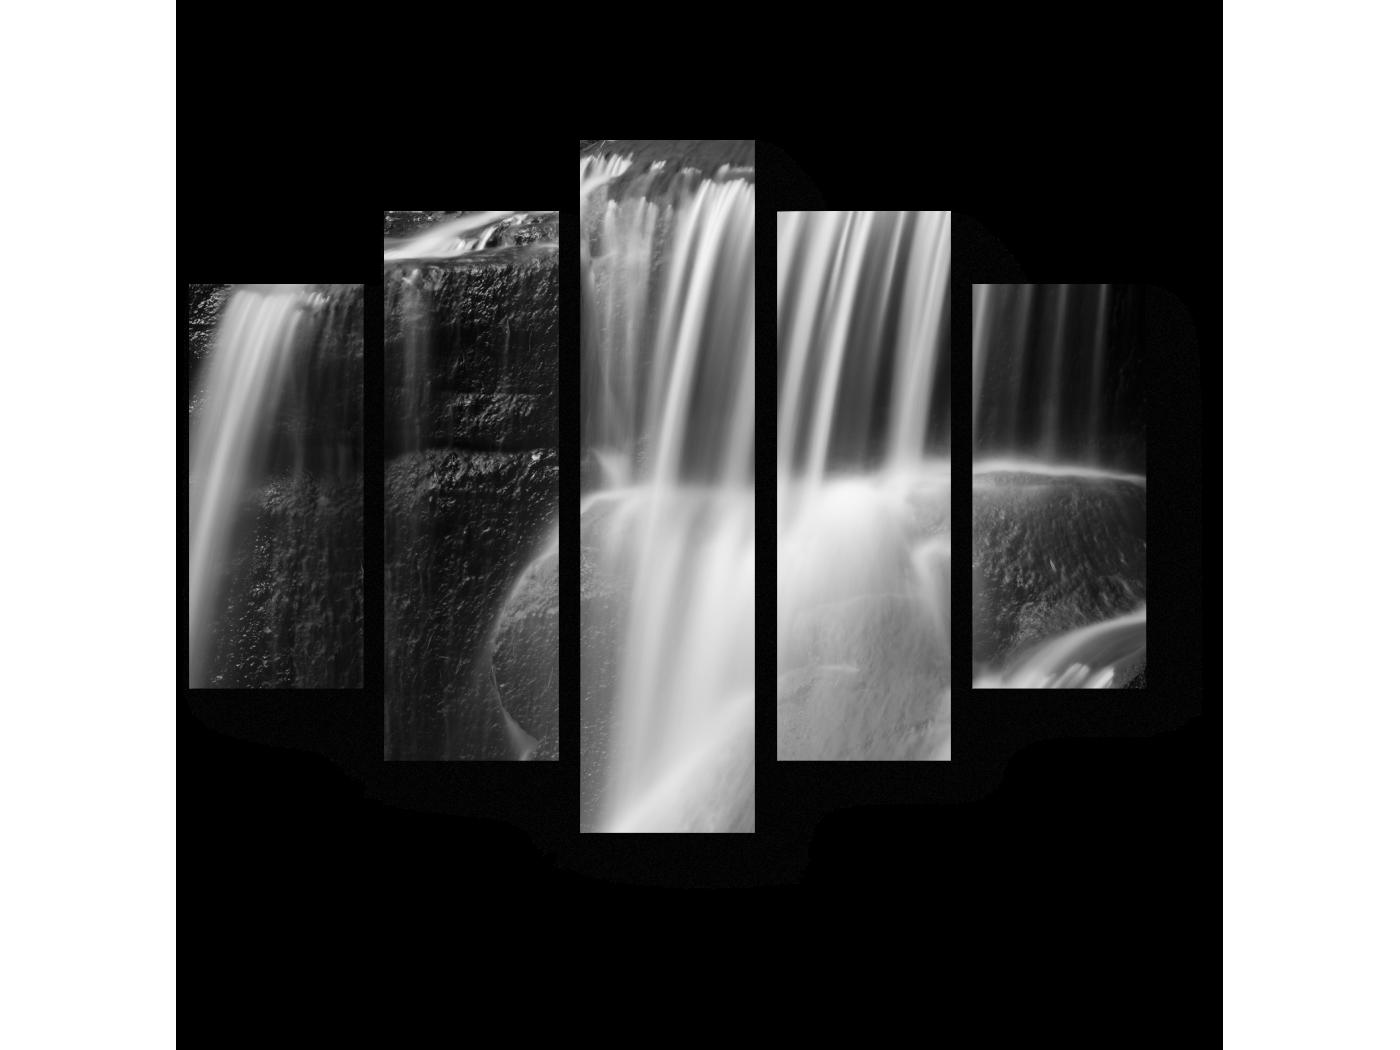 Модульная картина Монохромный водопад (75x60) фото